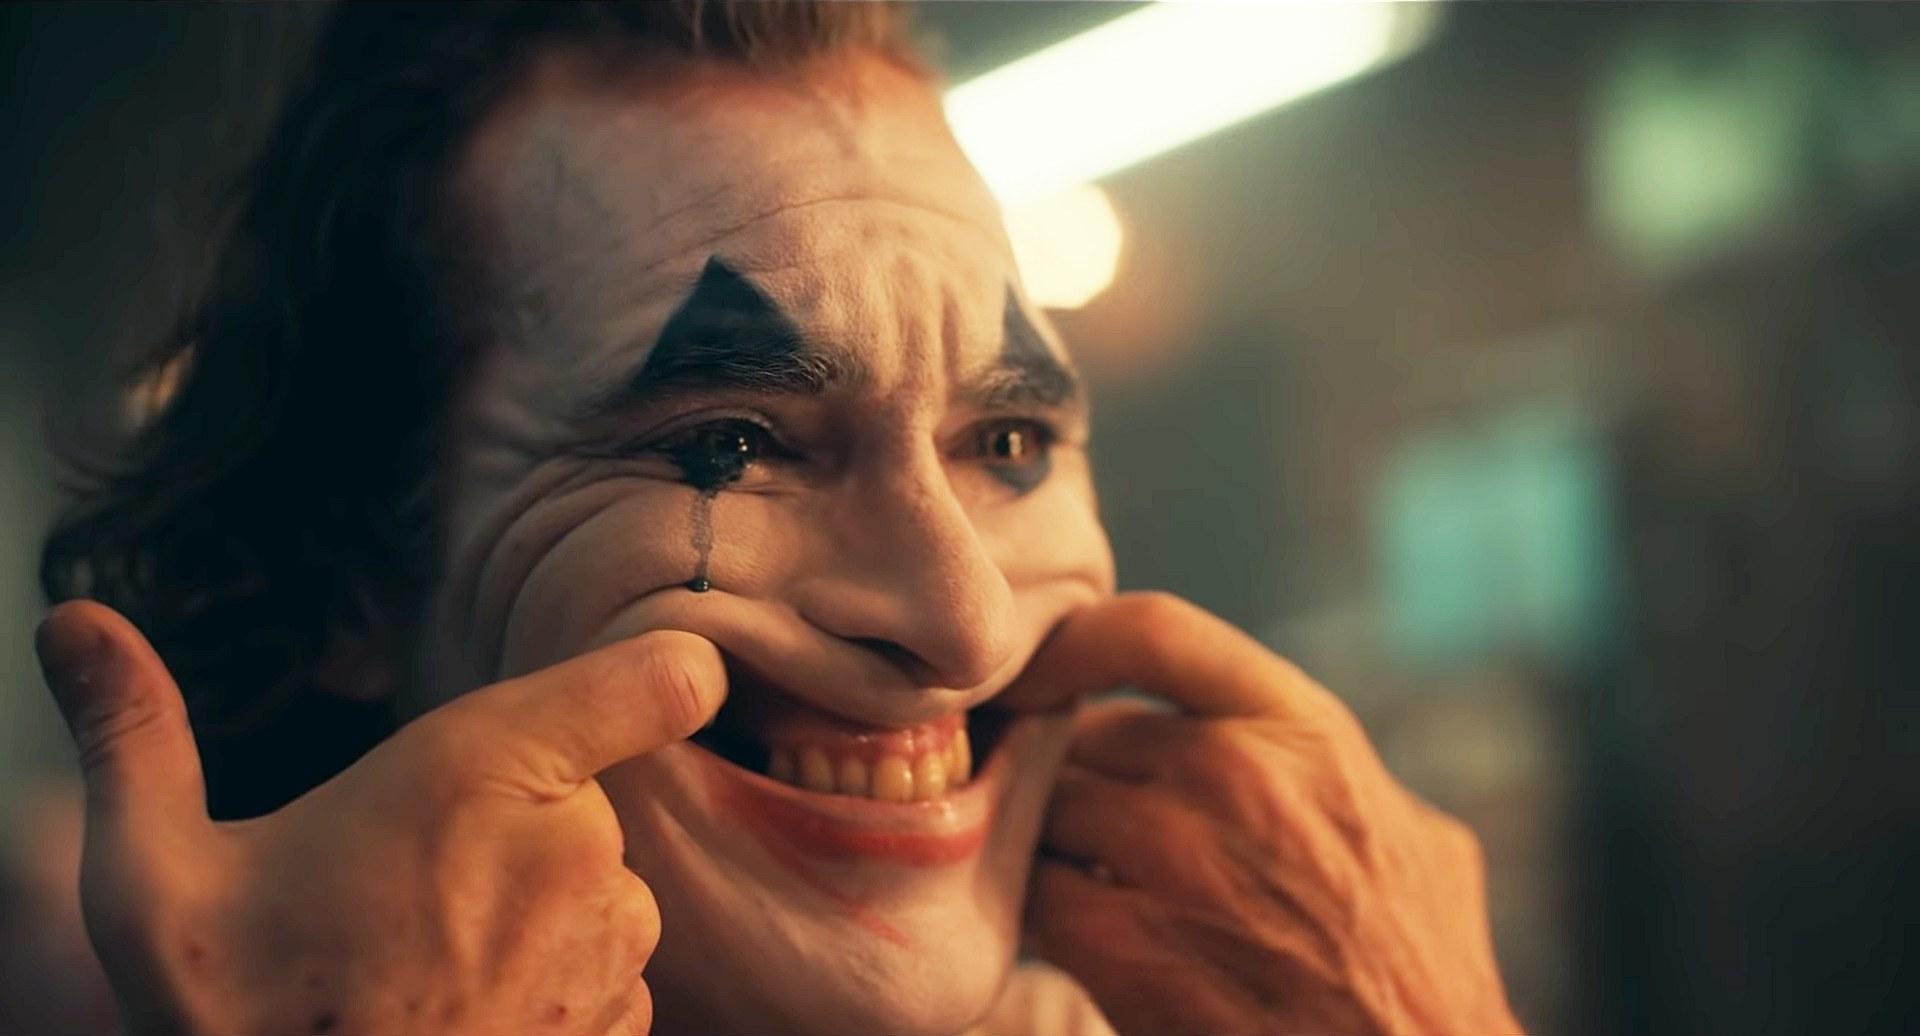 Joker - Trailer Talk - The Red Sparrow